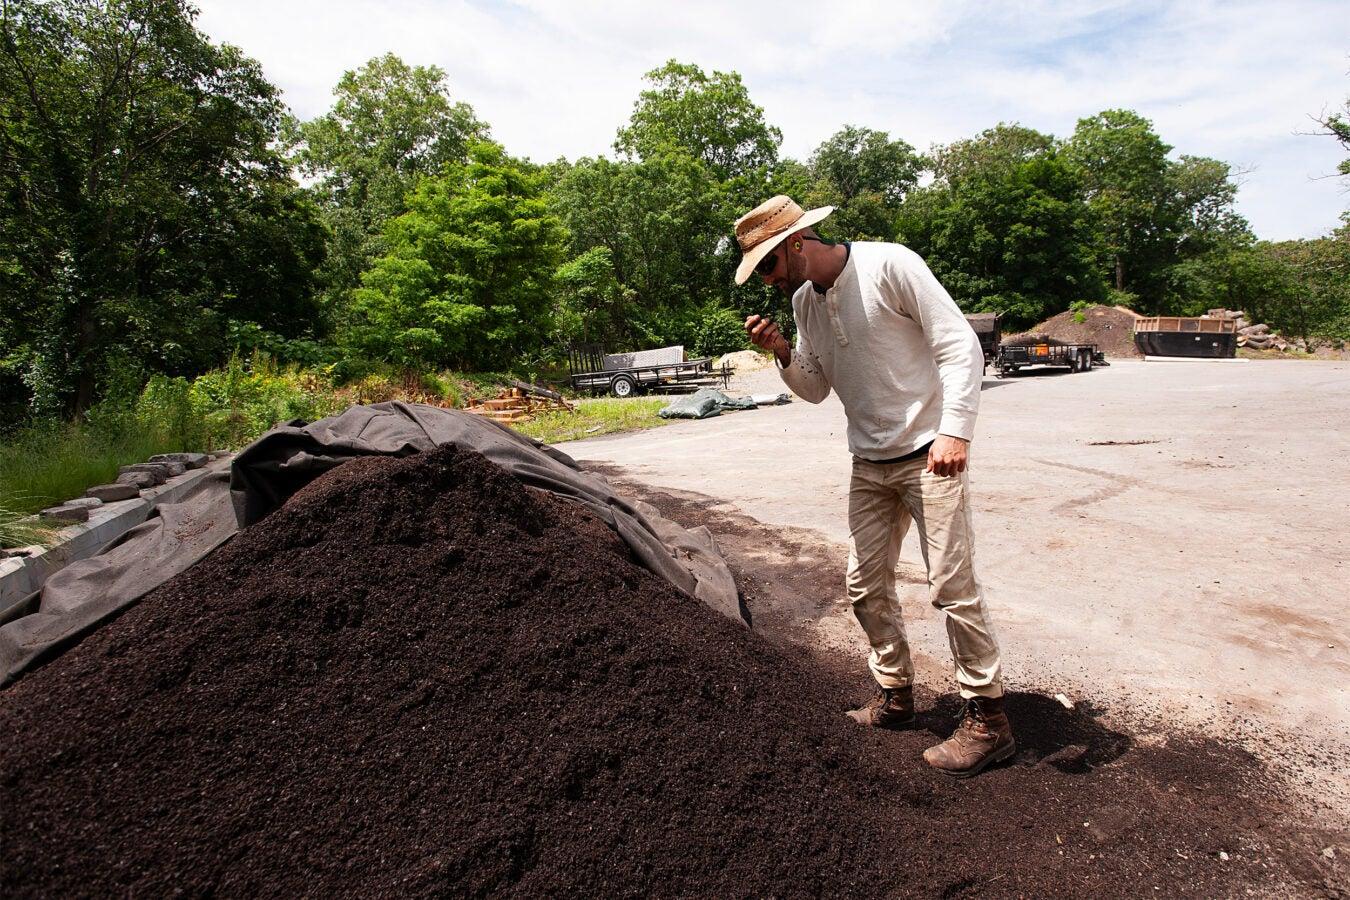 Man examines compost pile